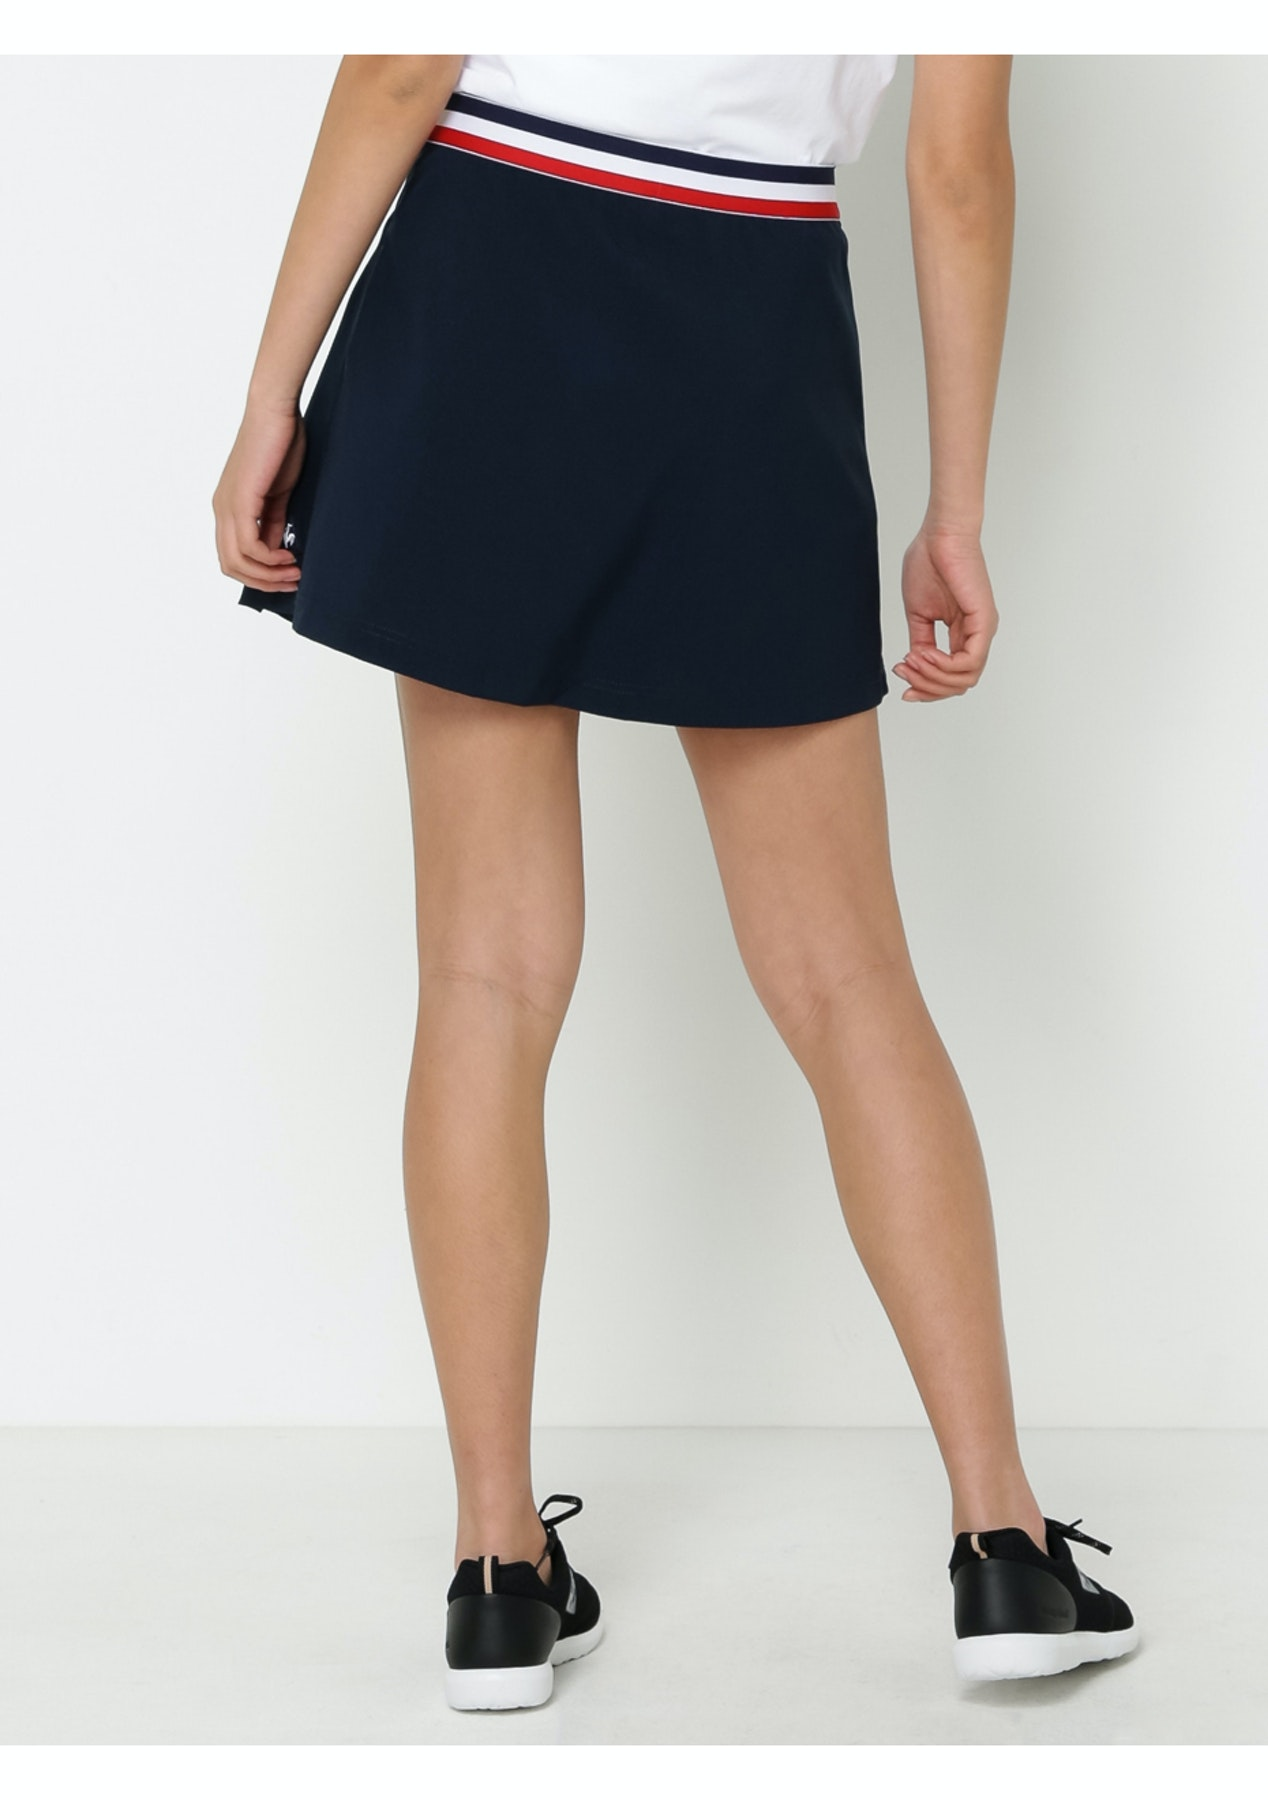 542e3e33f1f Le Coq Sportif - Womens Leala Skirt - Dress Blues - Le Coq Sportif - Onceit